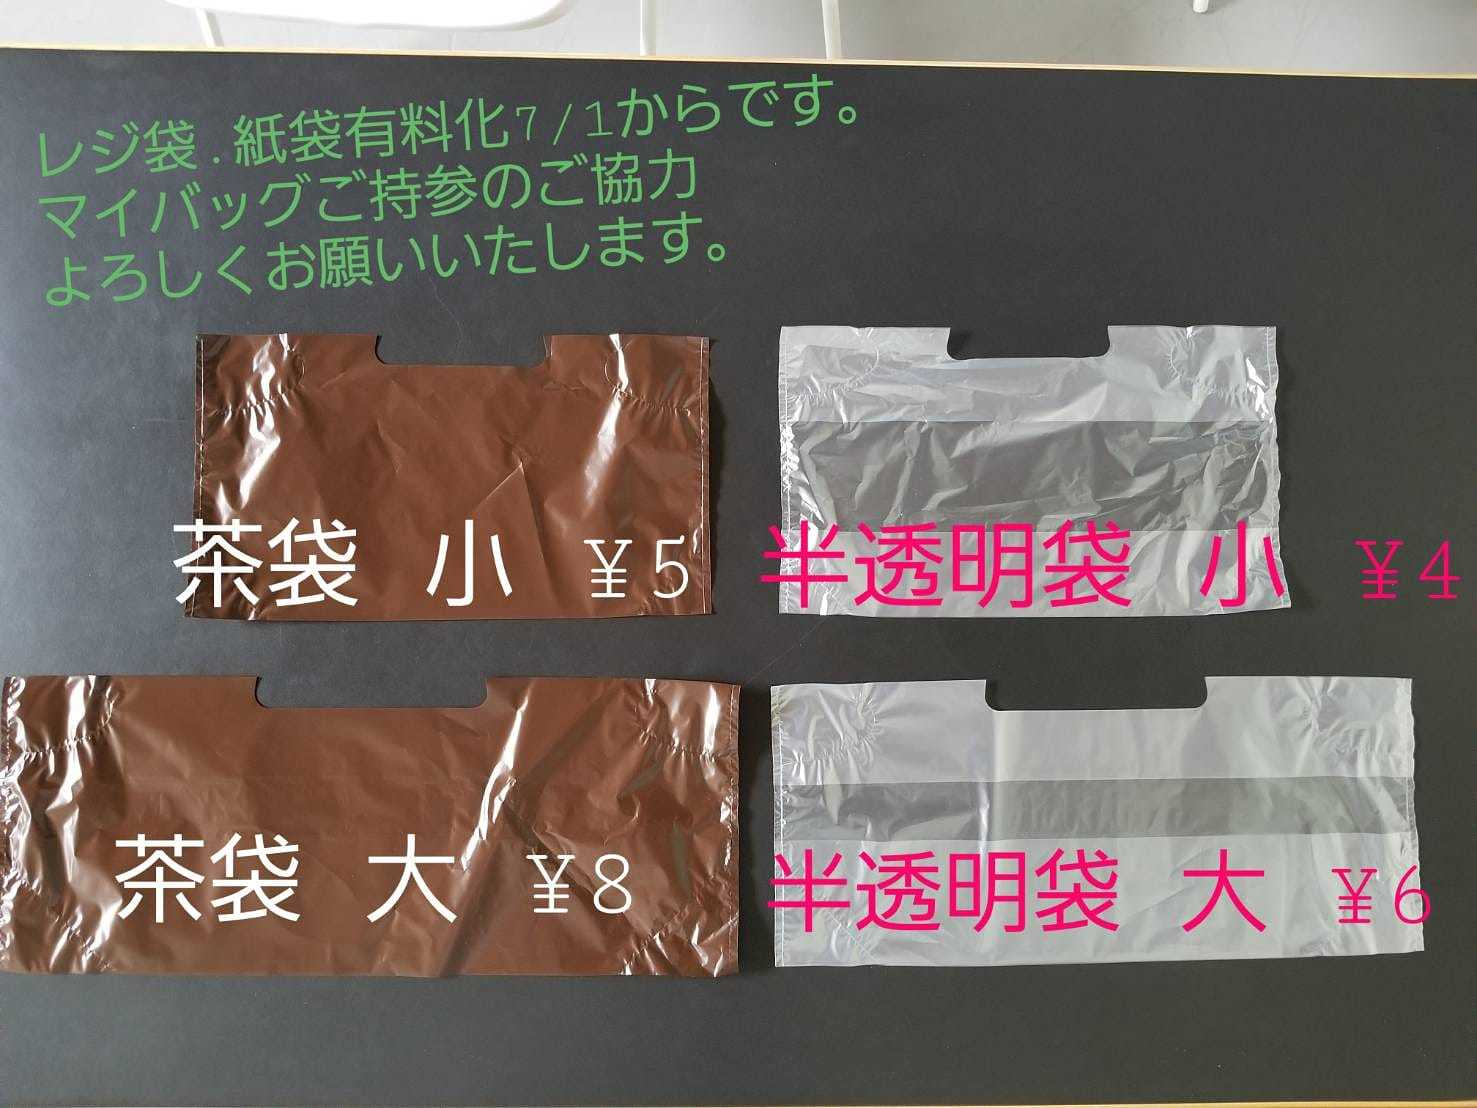 《レジ袋・紙袋有料化..._a0121154_16093134.jpg